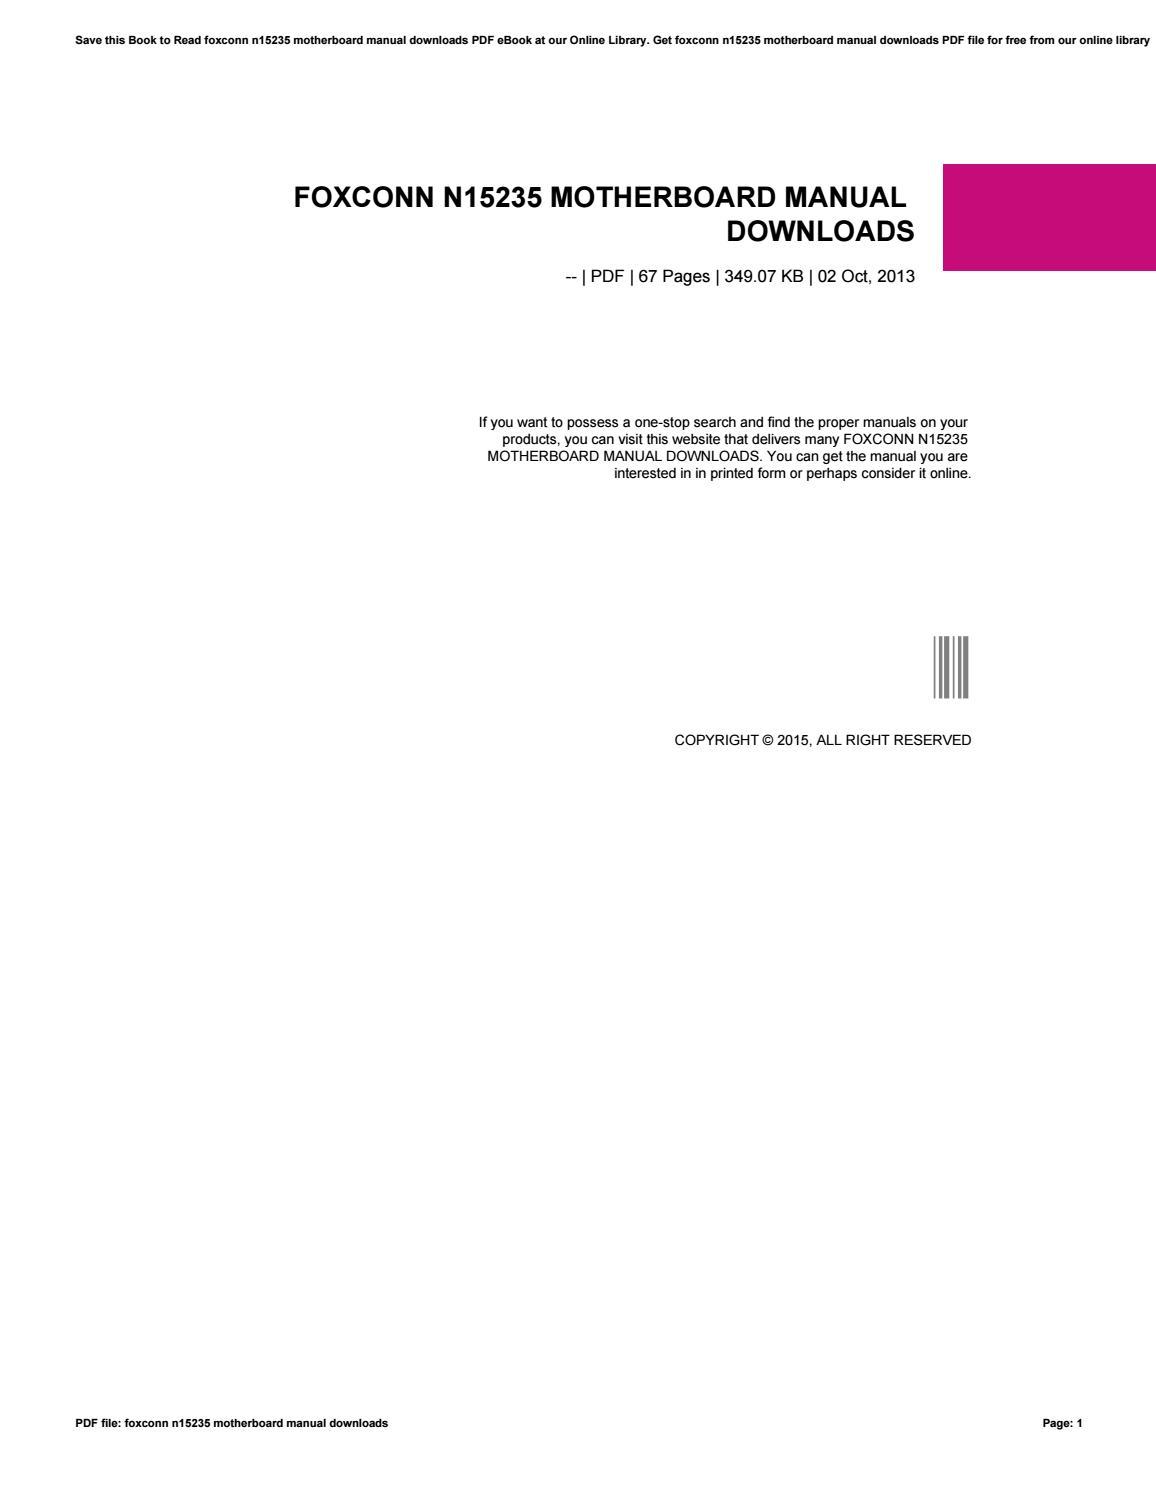 foxconn n15235 motherboard manual downloads by safty68ramadani issuu